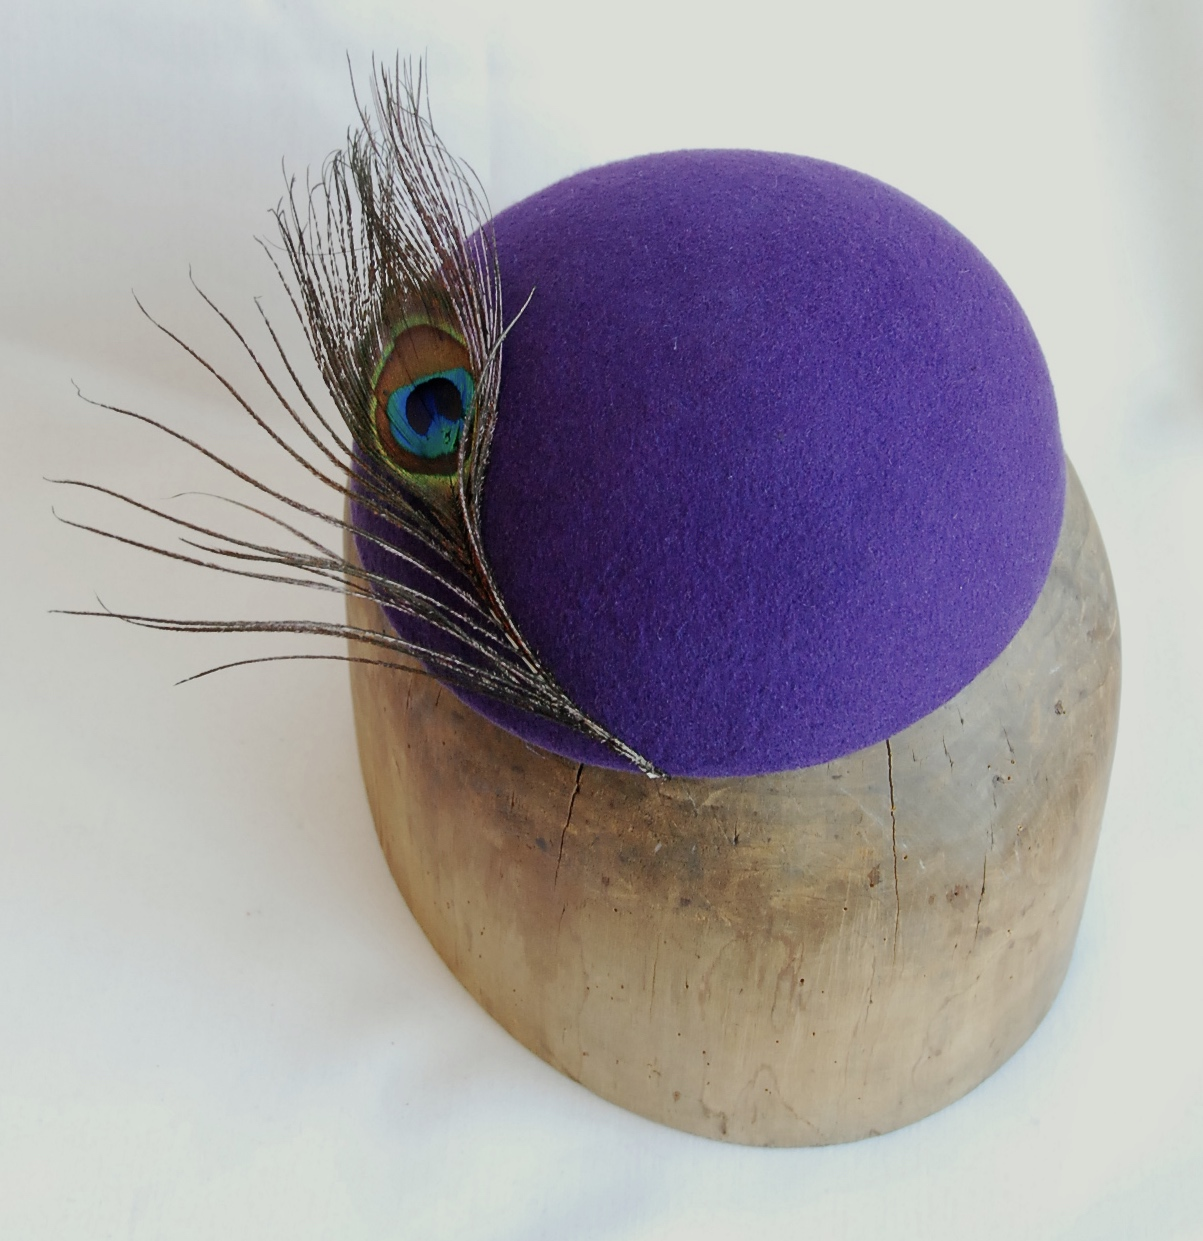 Purple felt beret with peacock